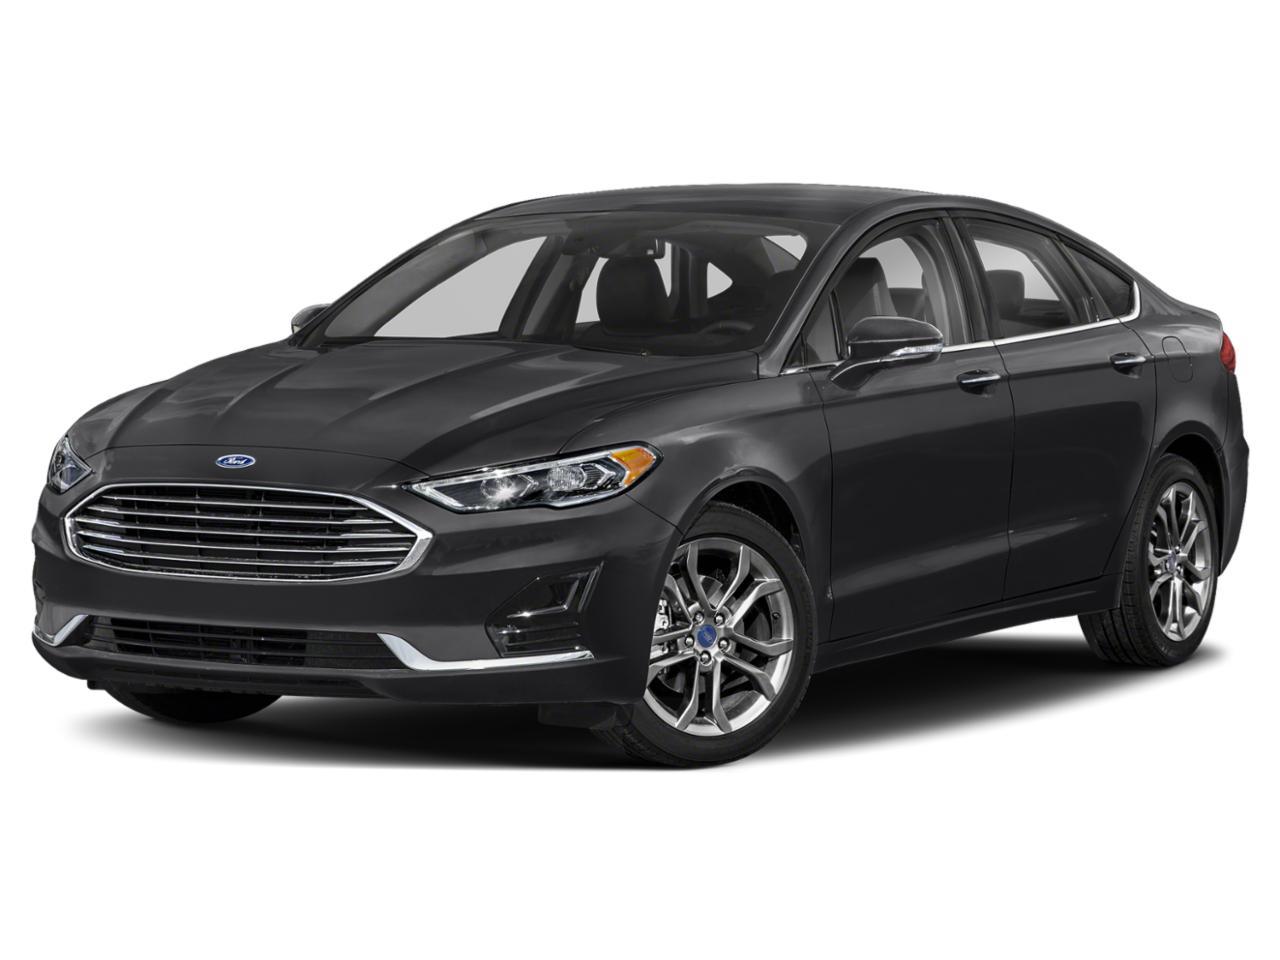 2020 Ford Fusion Vehicle Photo in BATON ROUGE, LA 70806-4464